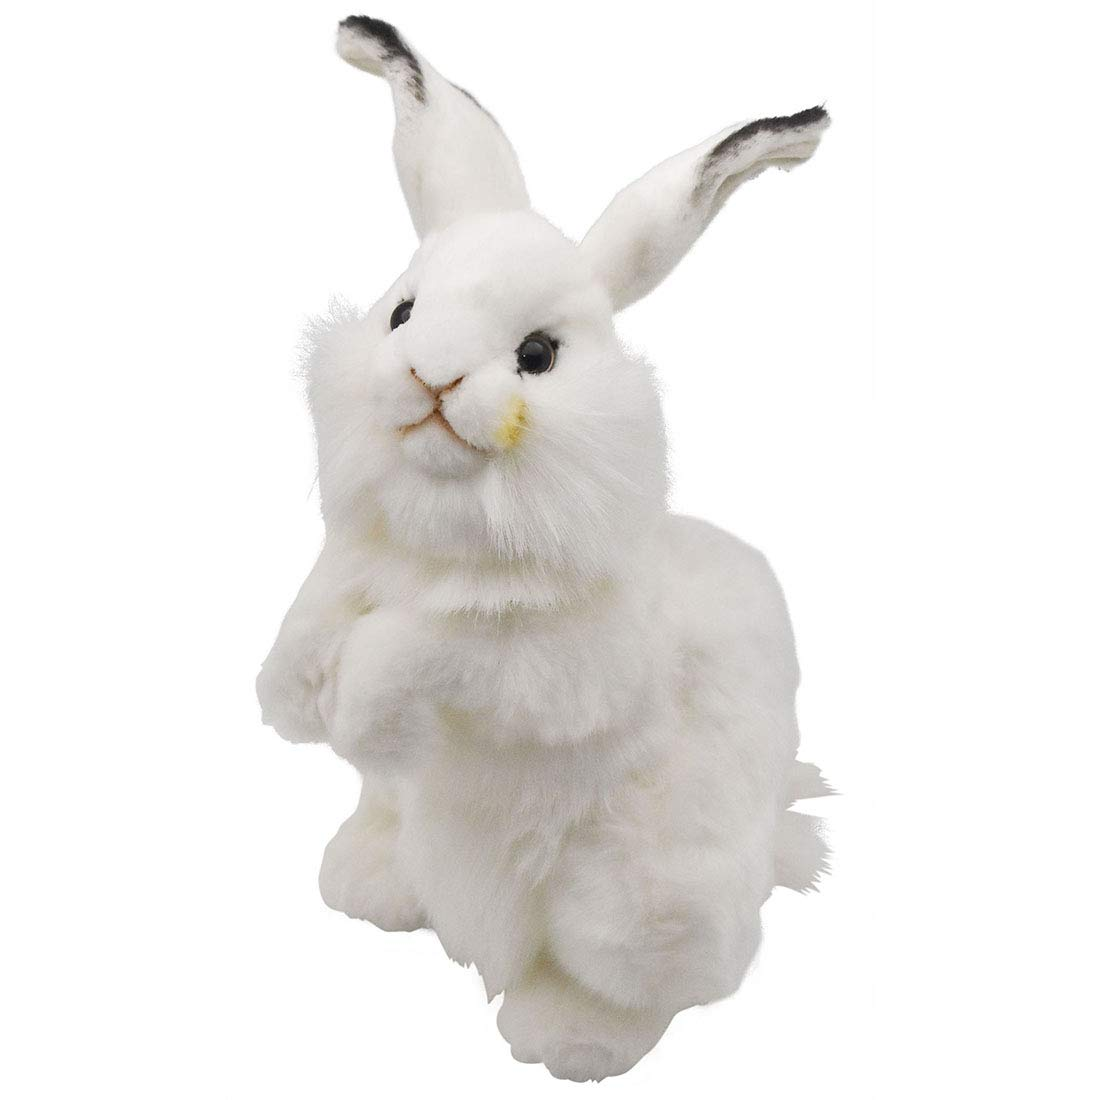 HANSA Rabbit Plush Animal Toy, 13'', White by HANSA